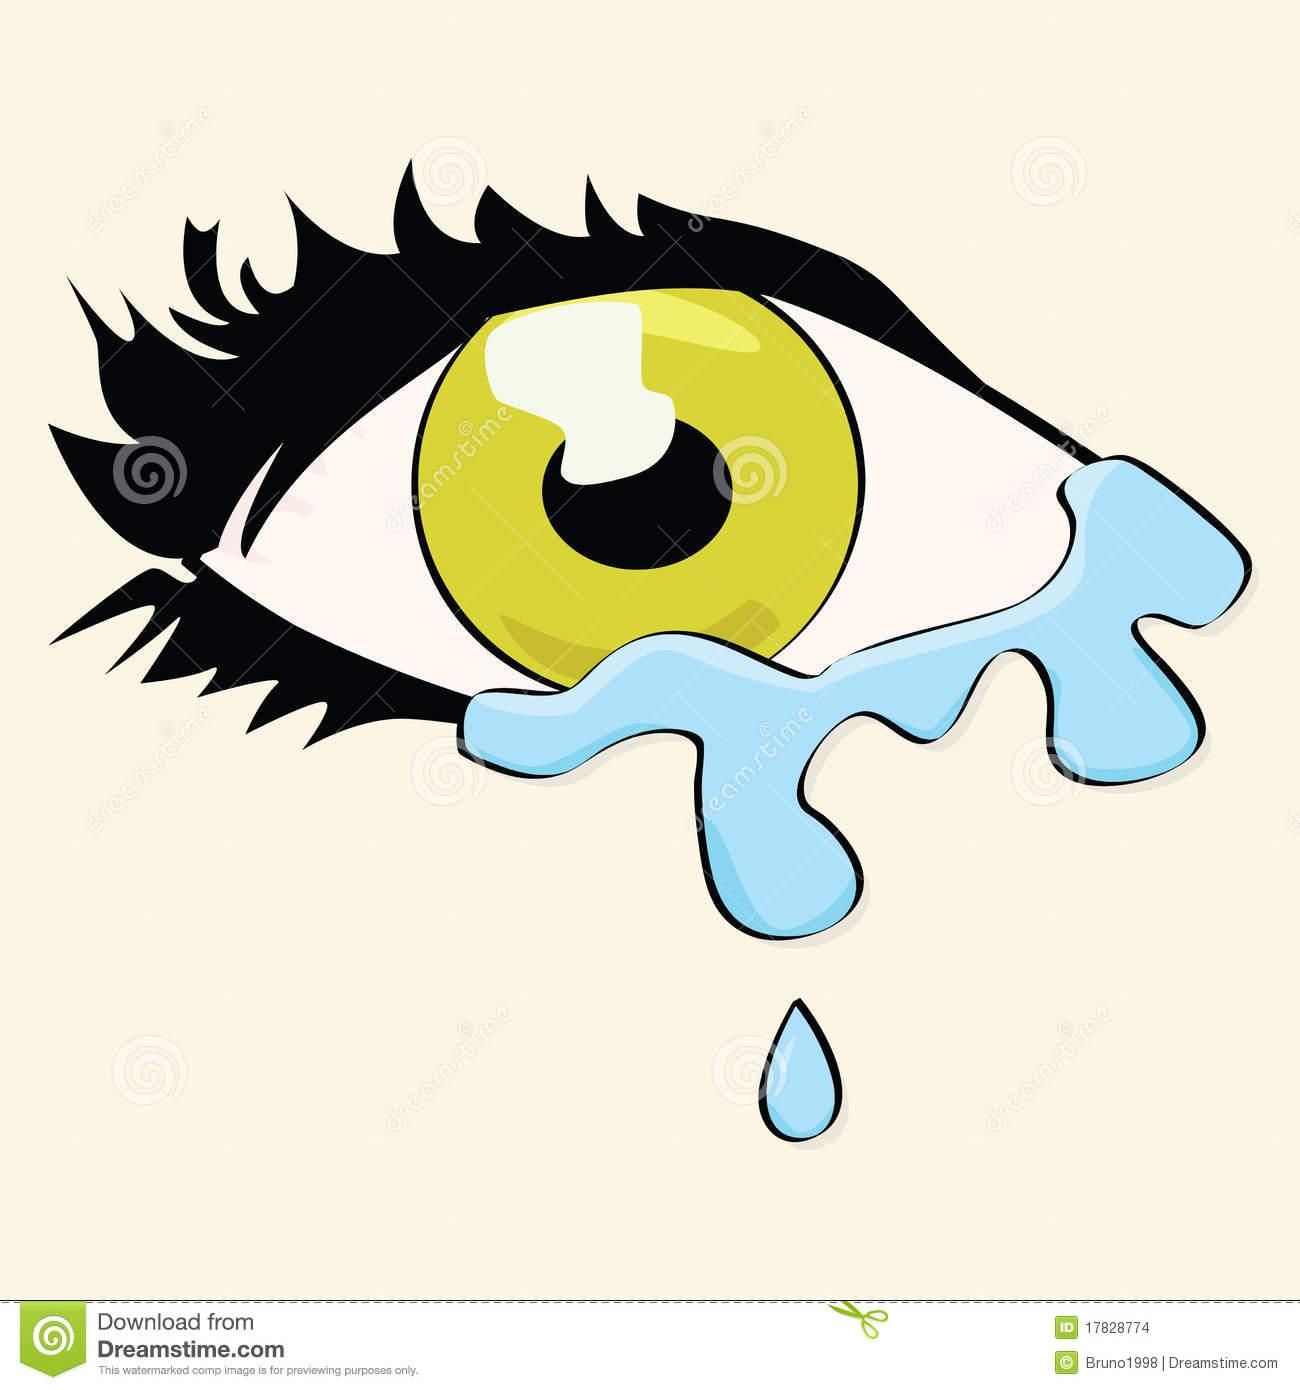 400+ Free Tears & Sad Images - Pixabay